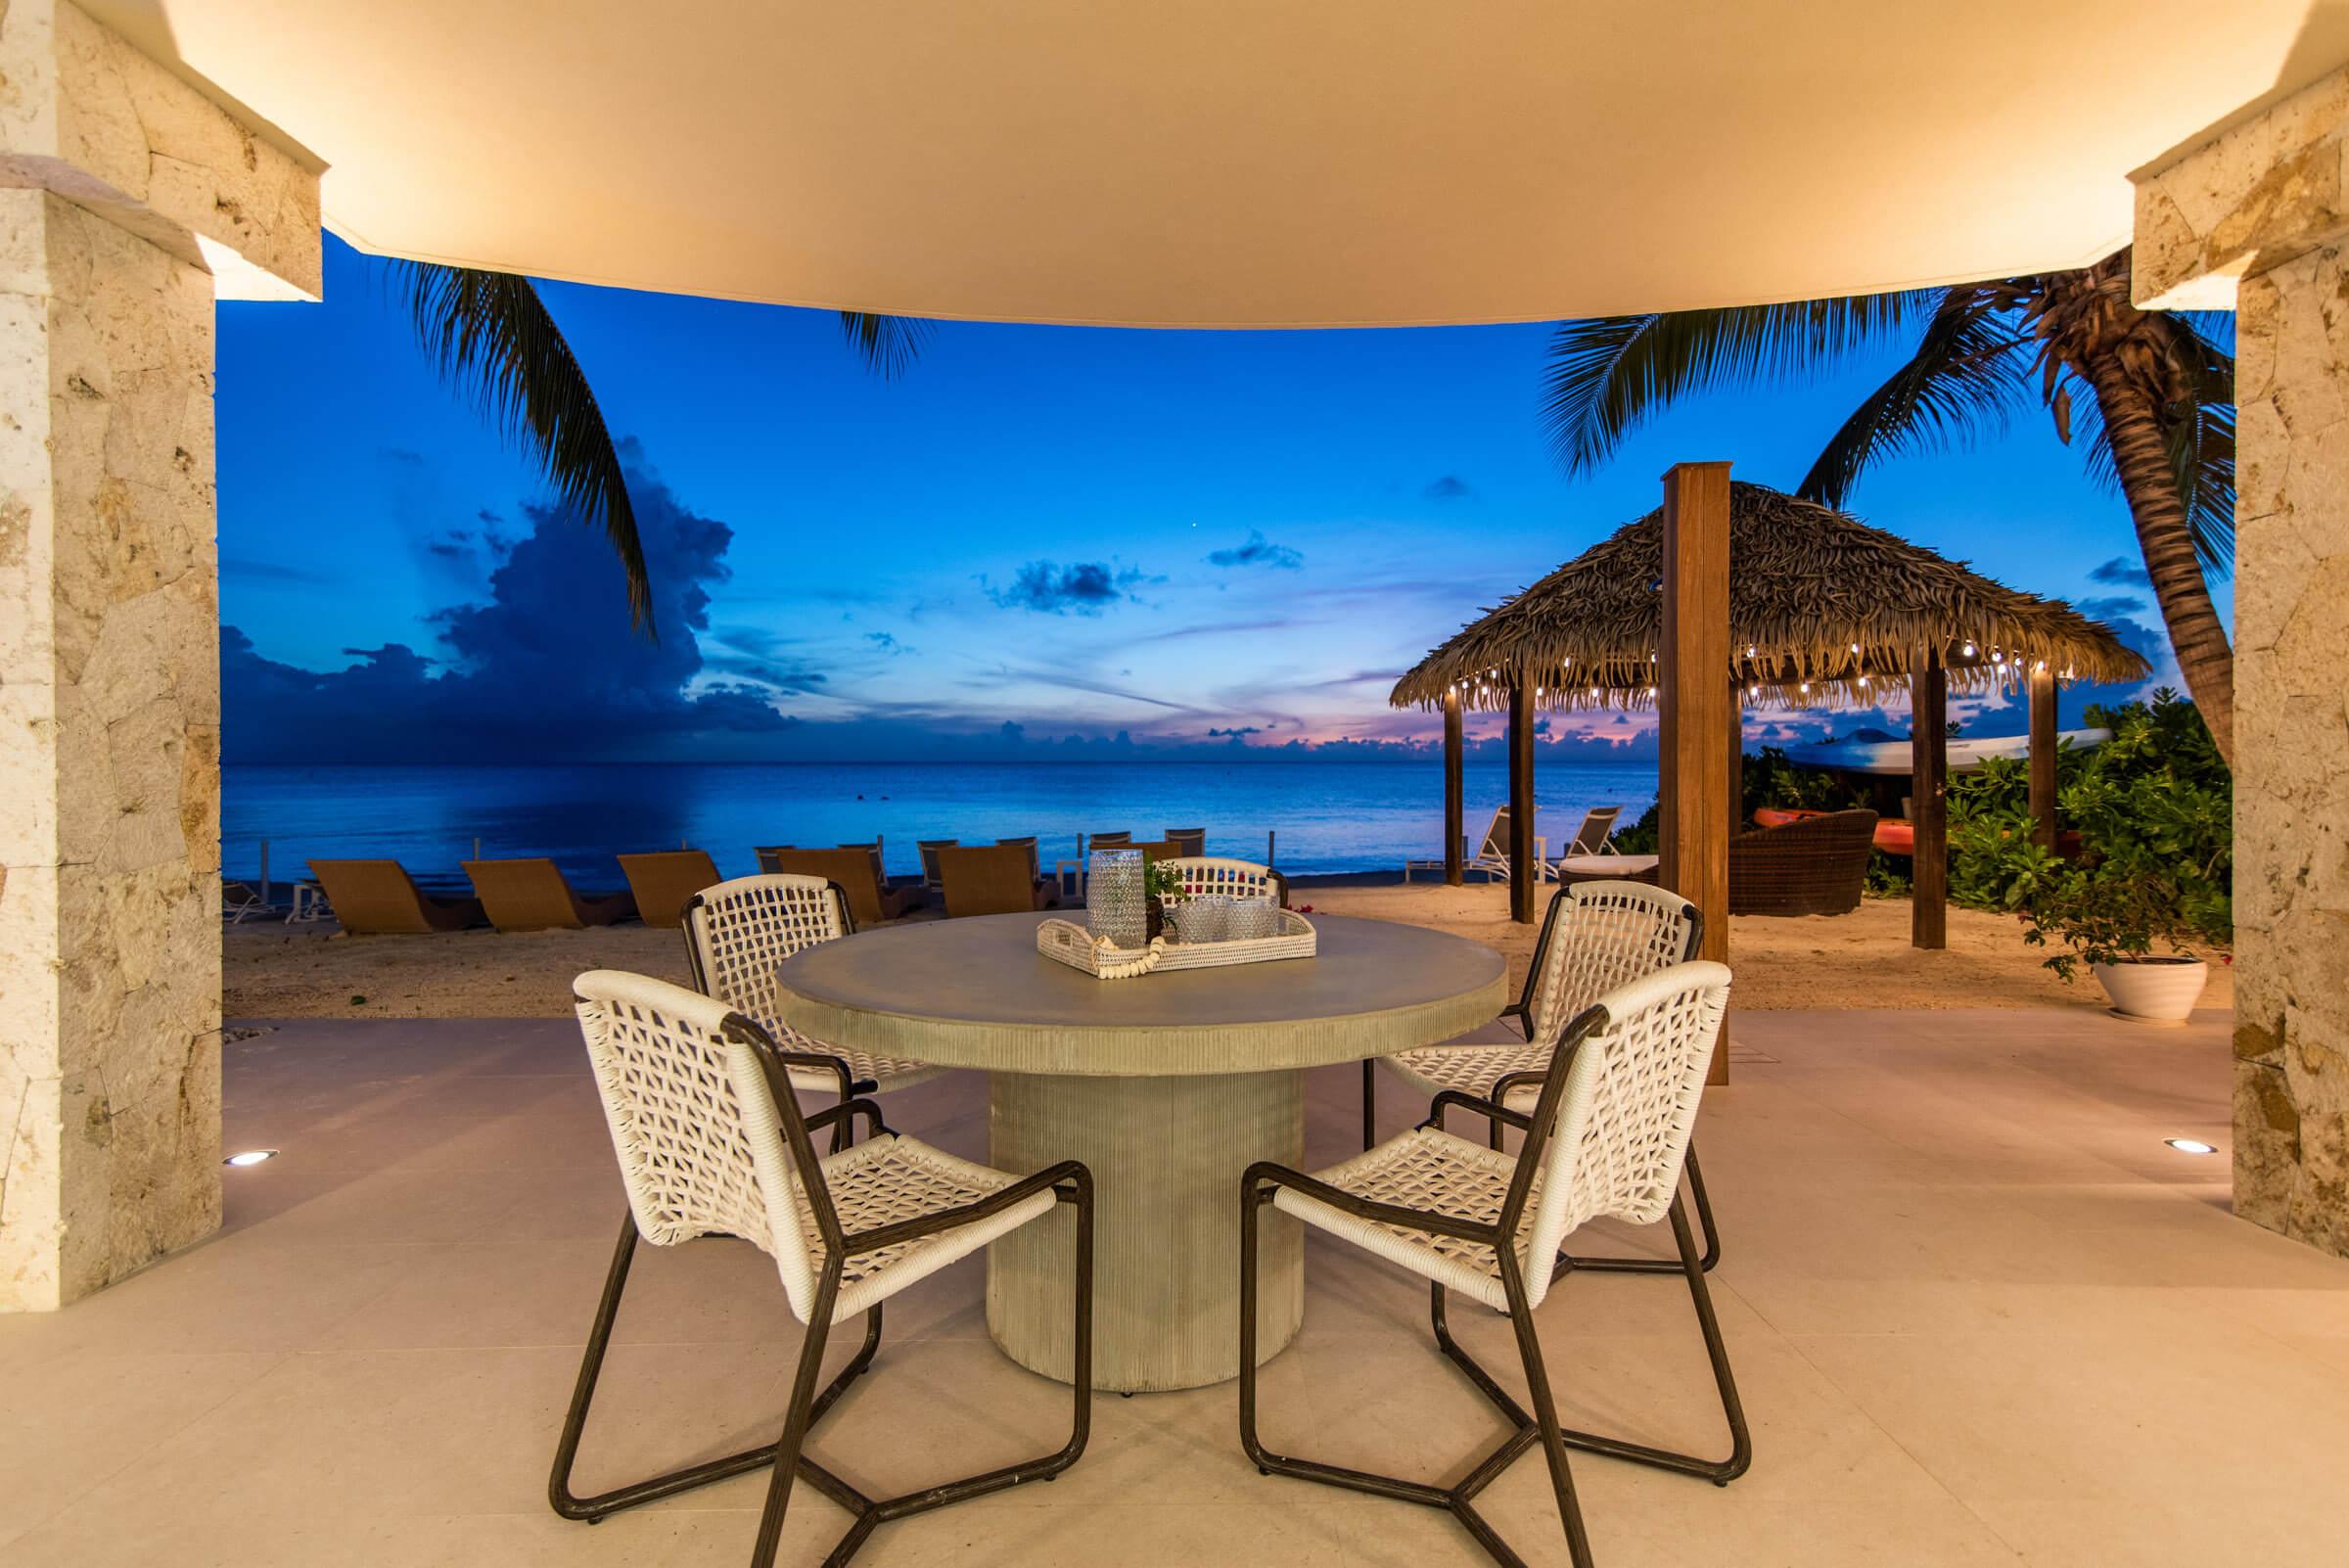 Seascape Villa Cayman Islands Luxury Caribbean Vacation Home Rental